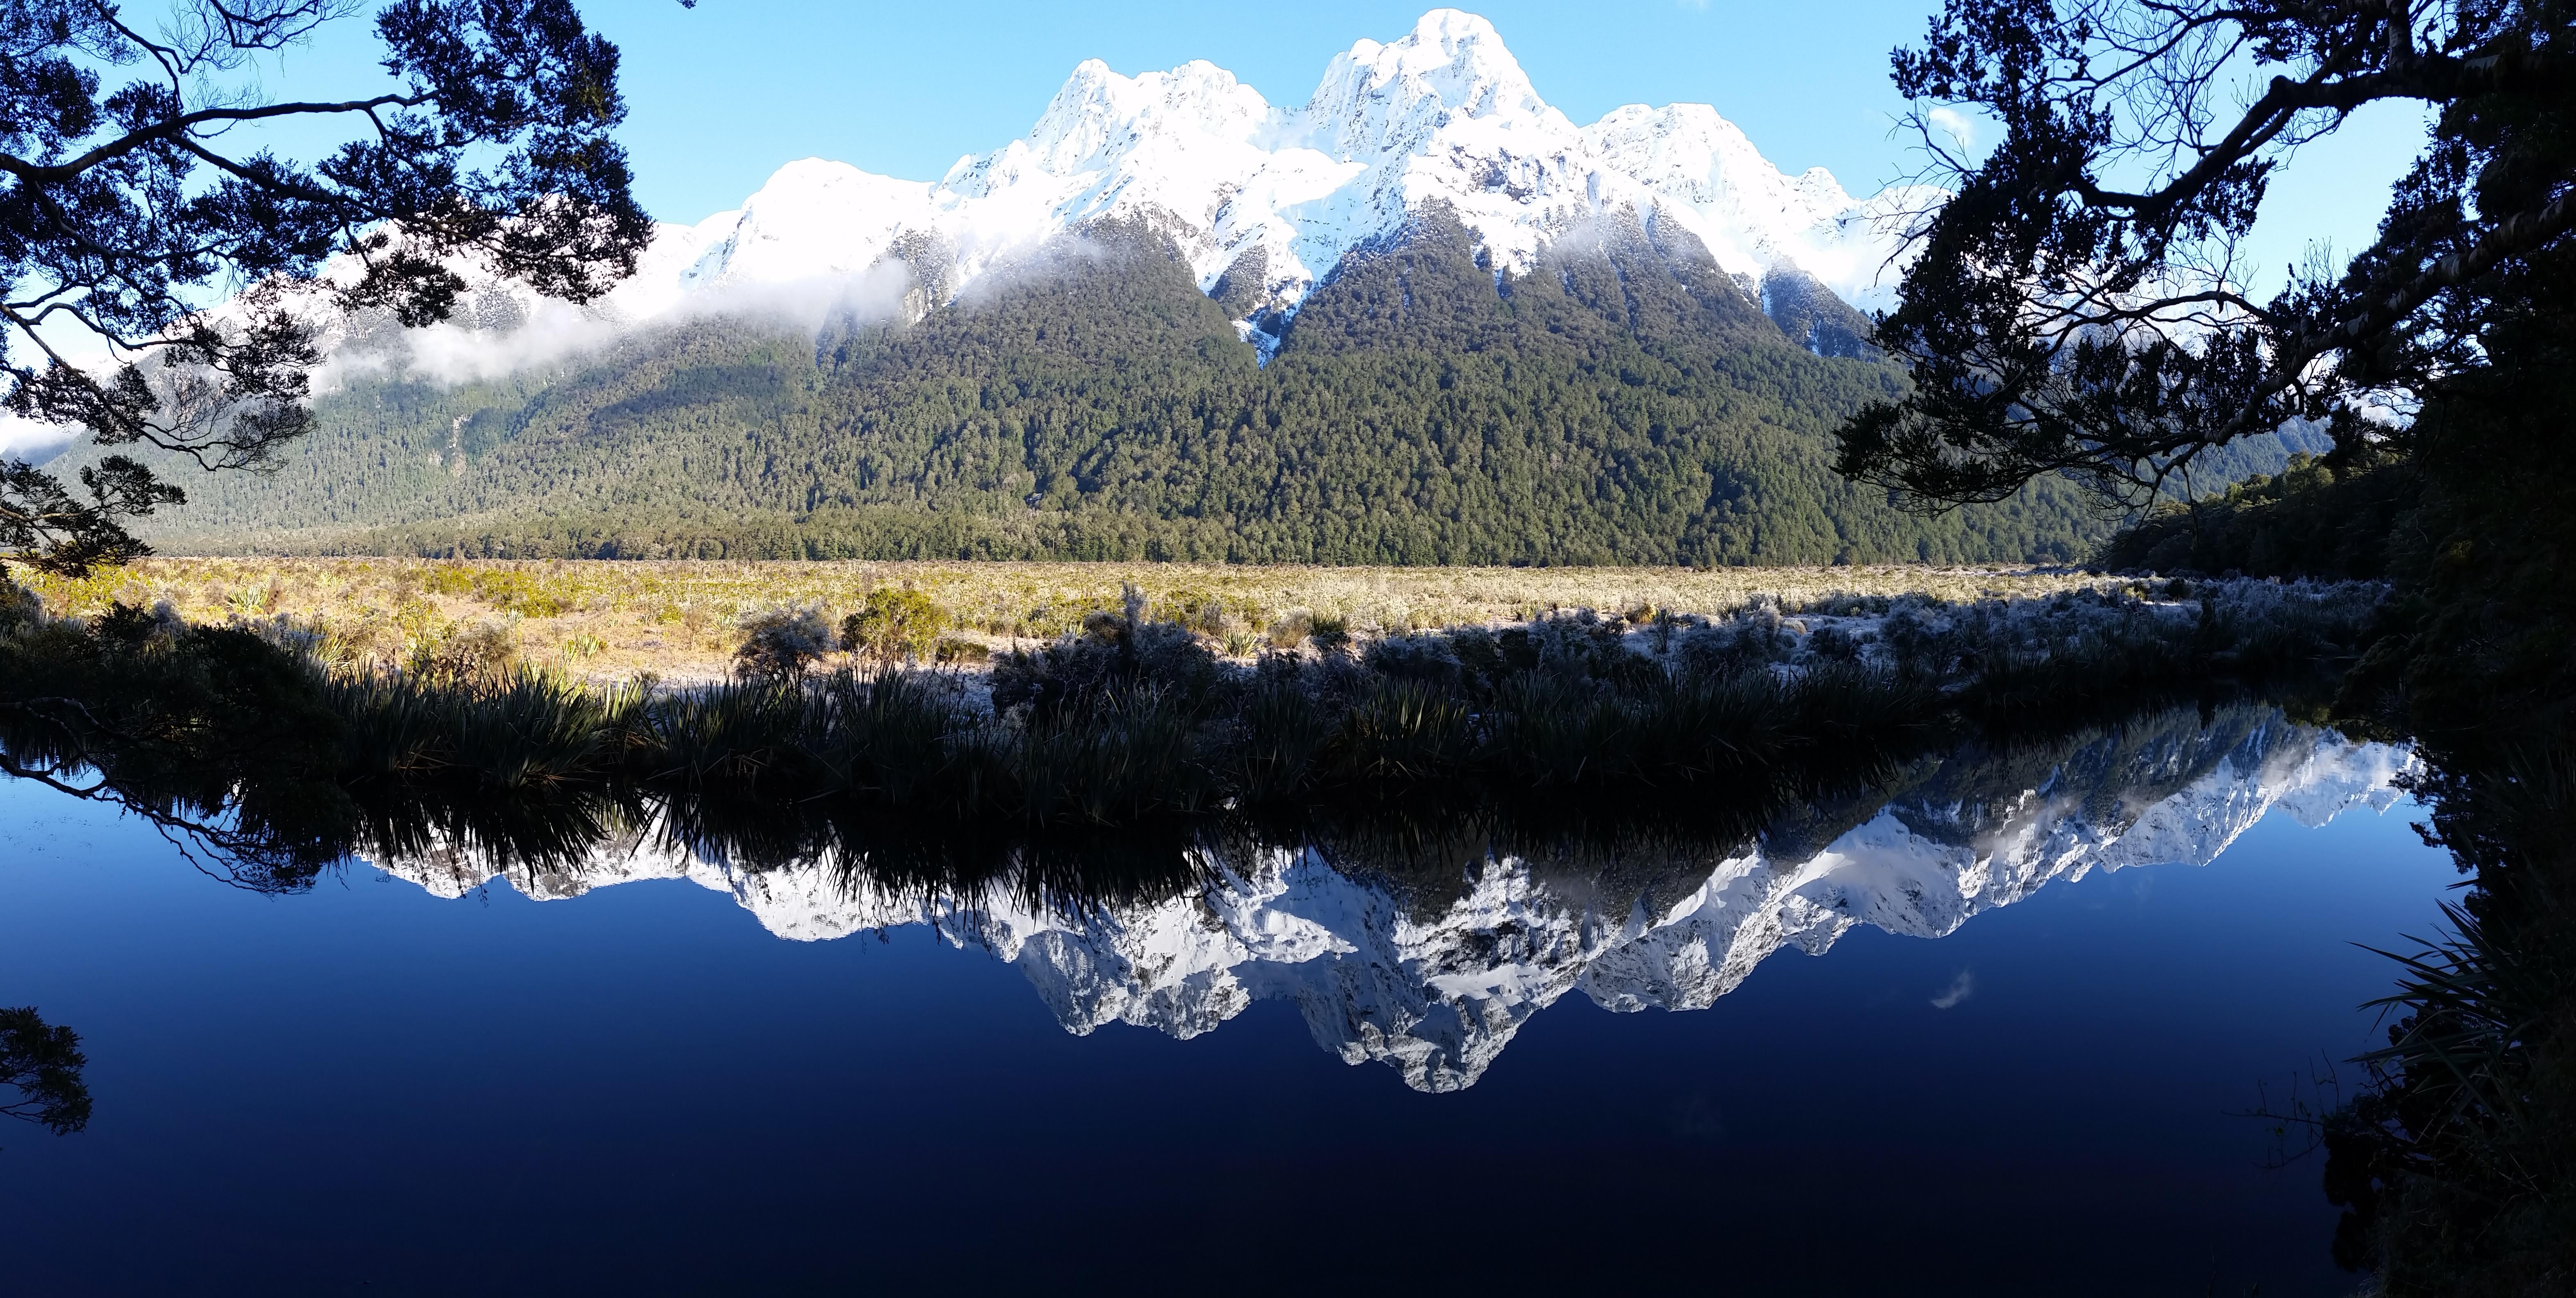 Gambar Pemandangan Pohon Air Gurun Gunung Salju Awan